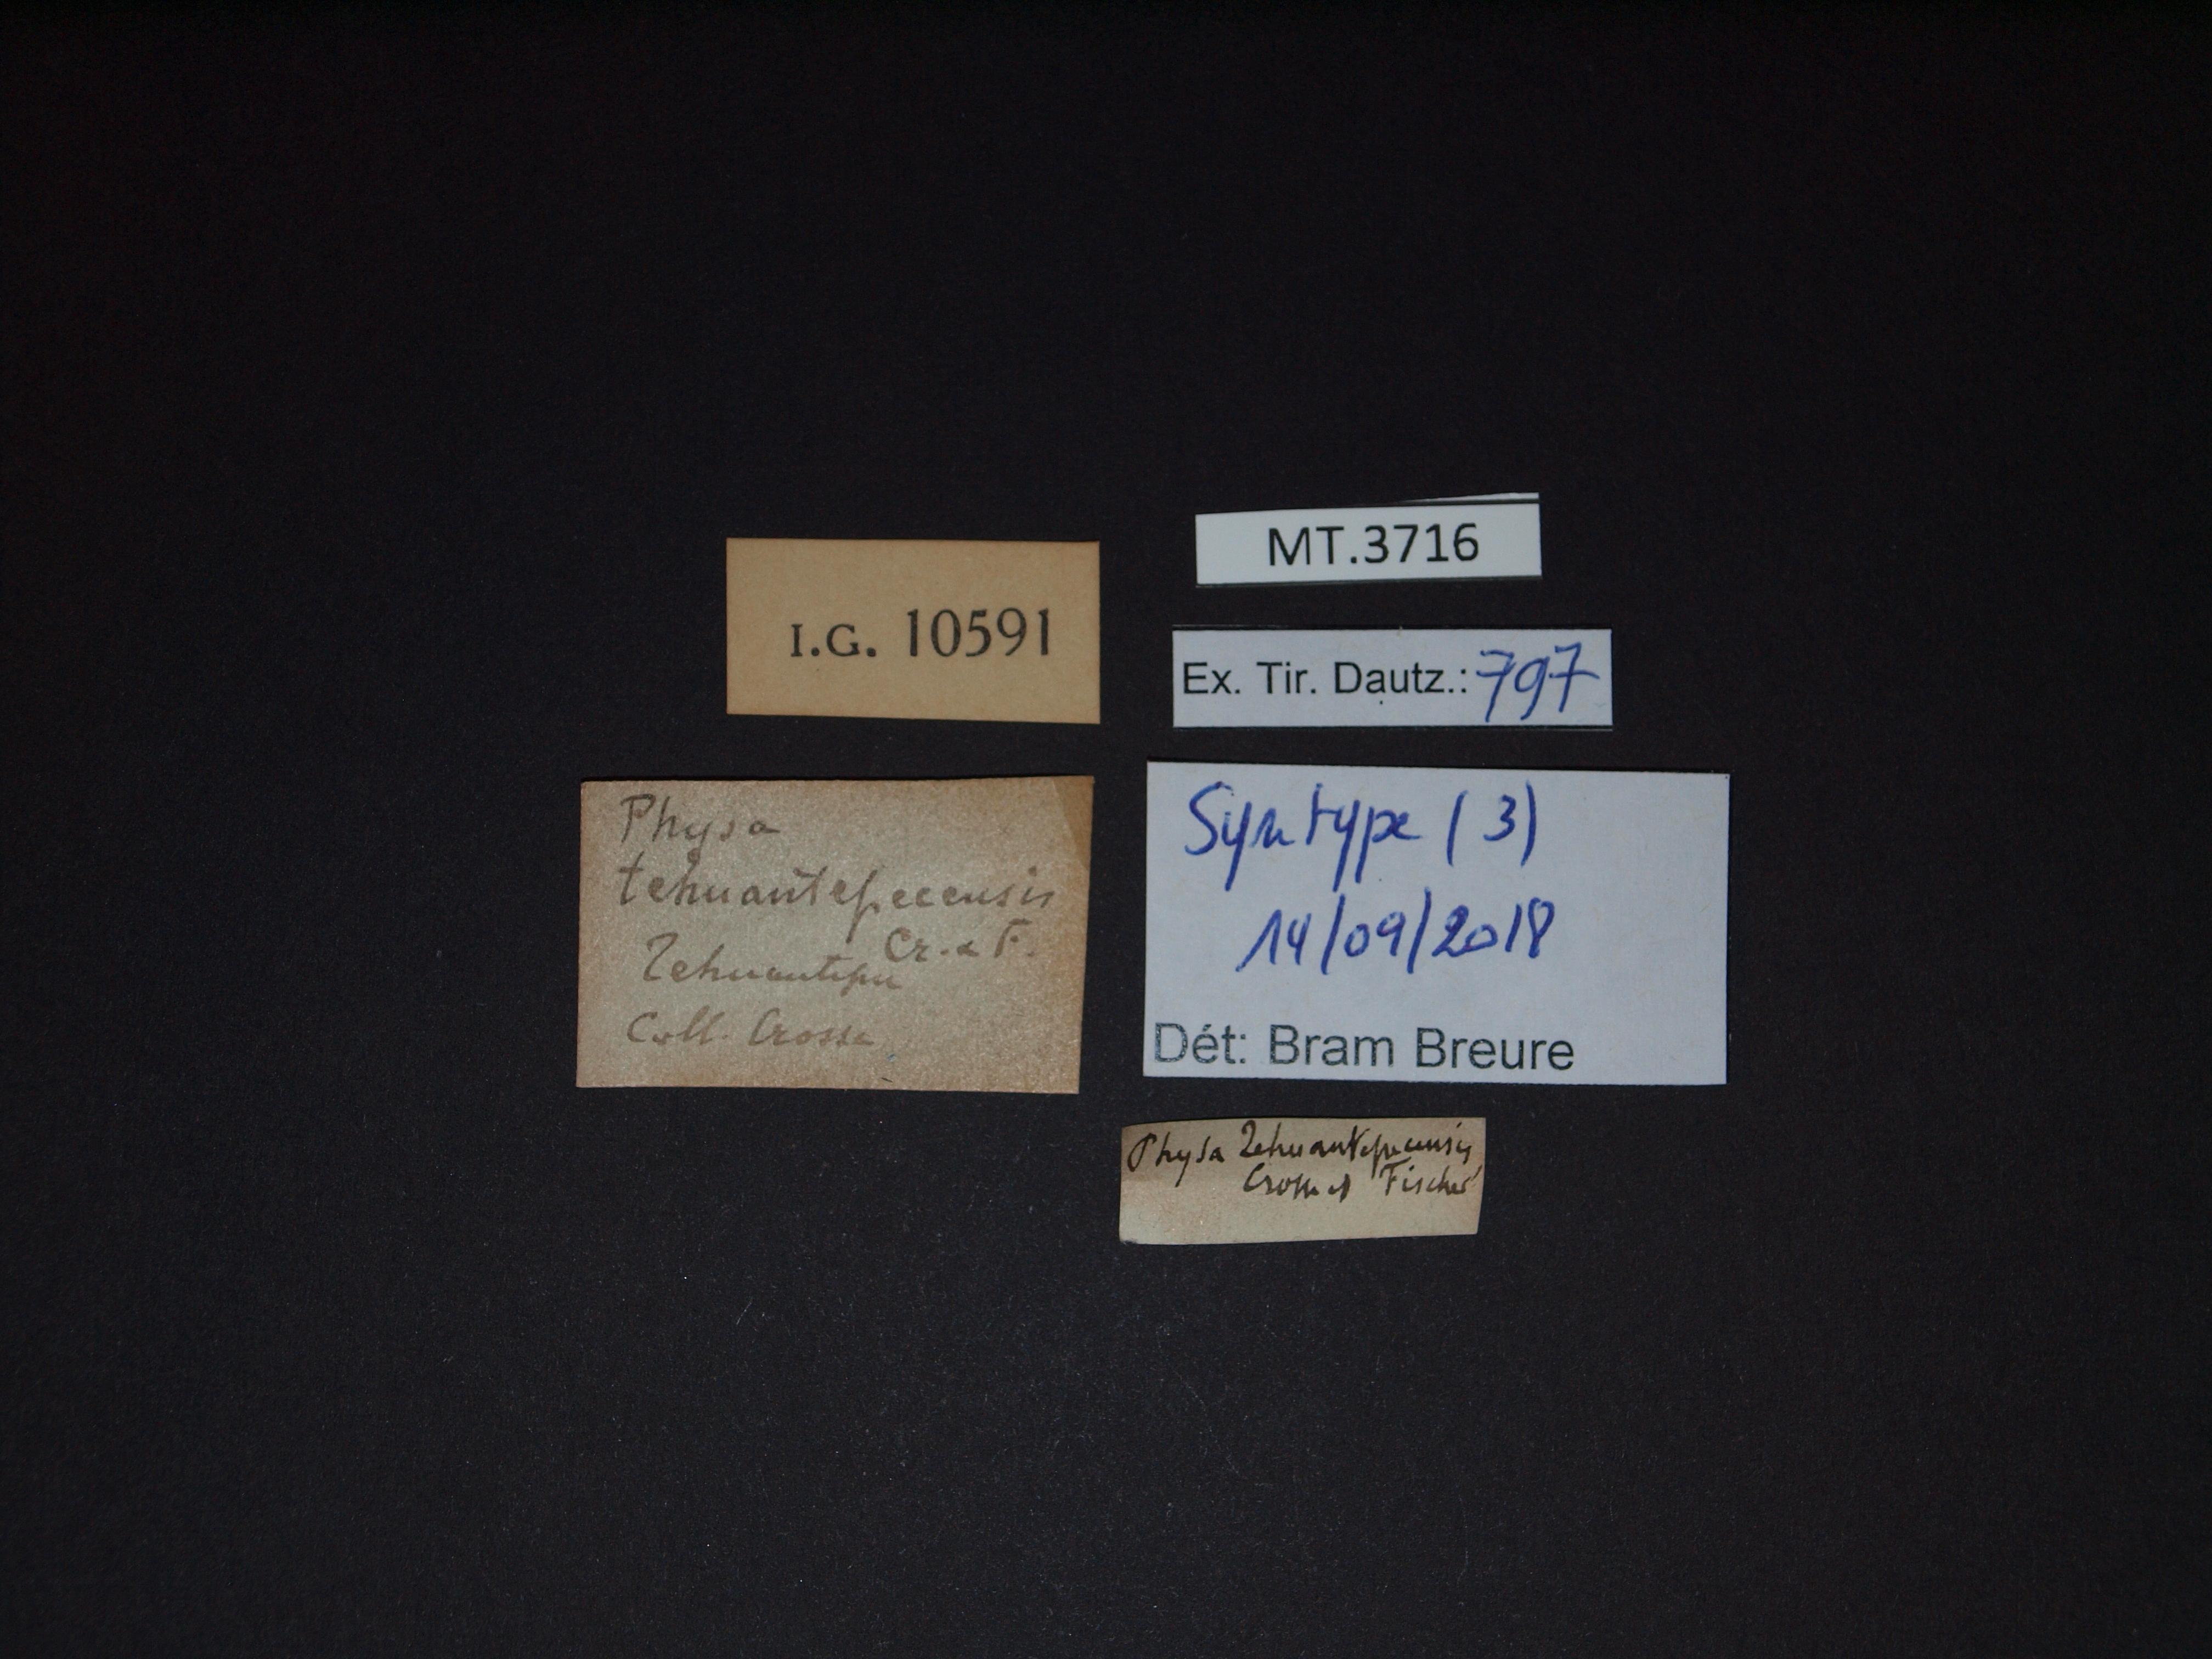 BE-RBINS-INV MT.3716 Physa tehuantepecensis st Lb.jpg